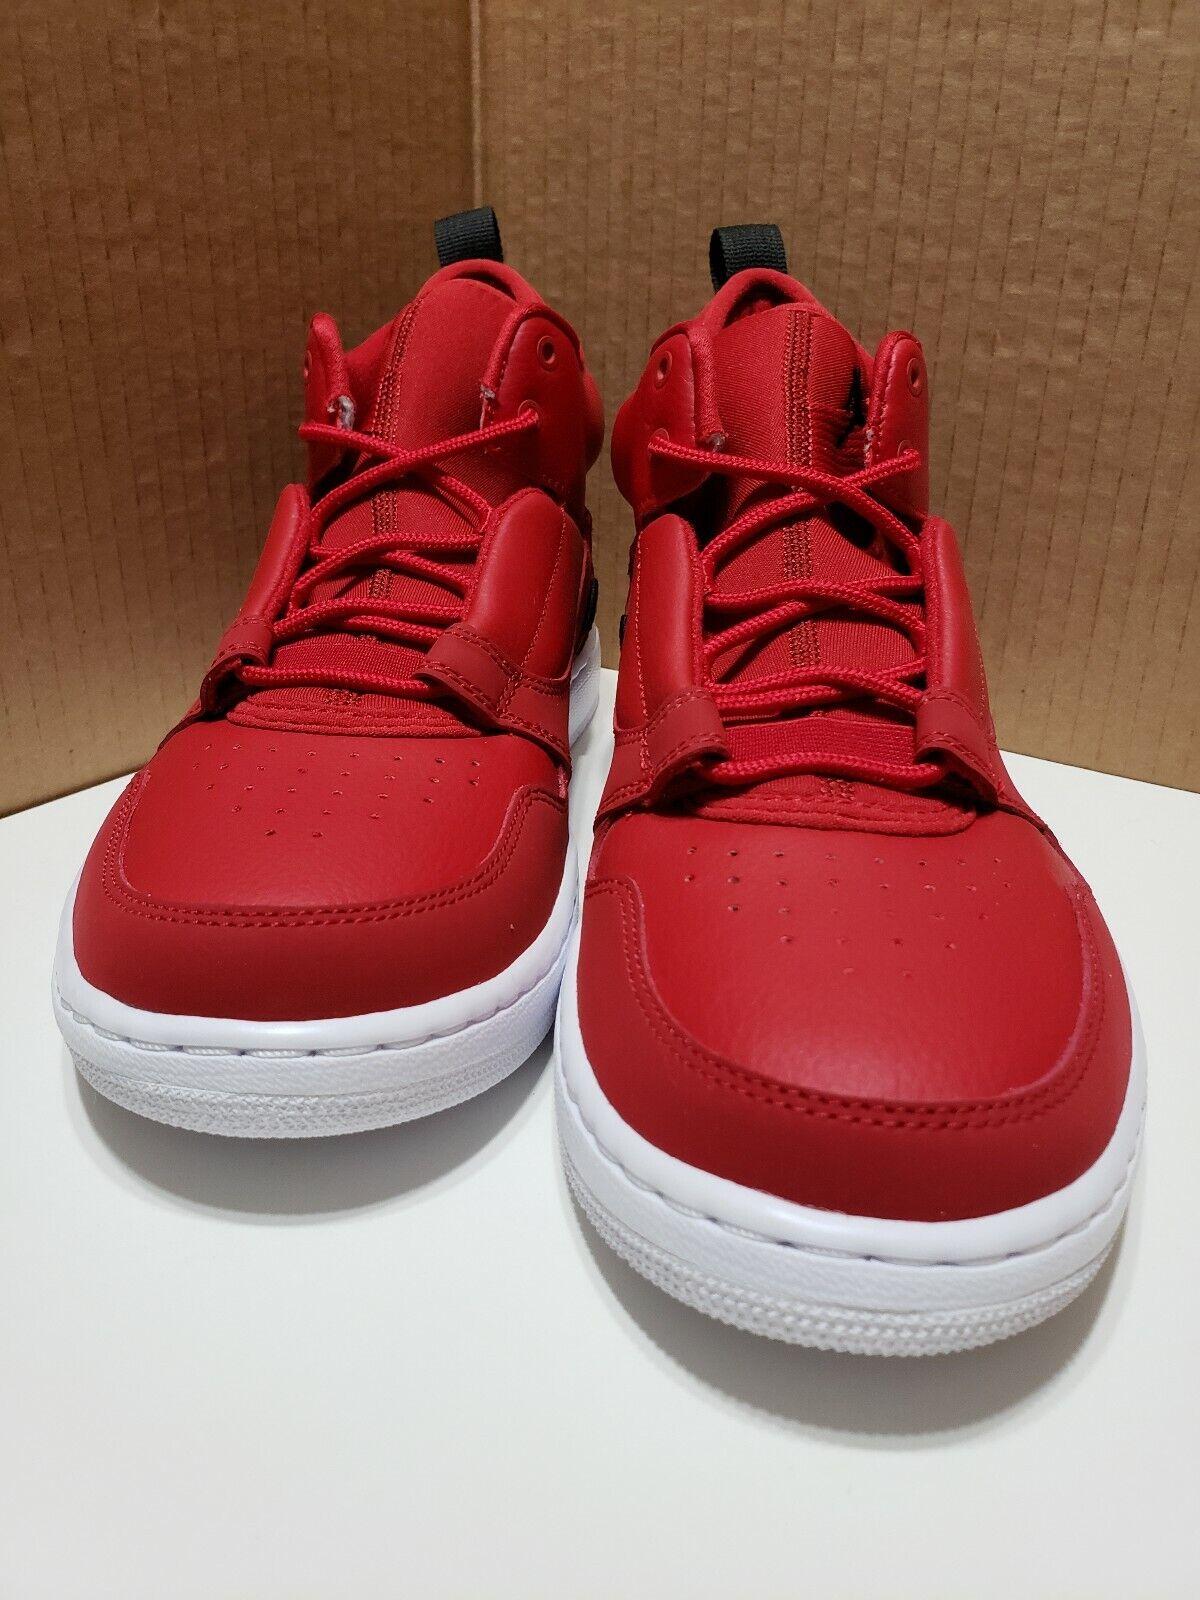 Nike Jordan Fadeaway Gym Red Black AO1329 600